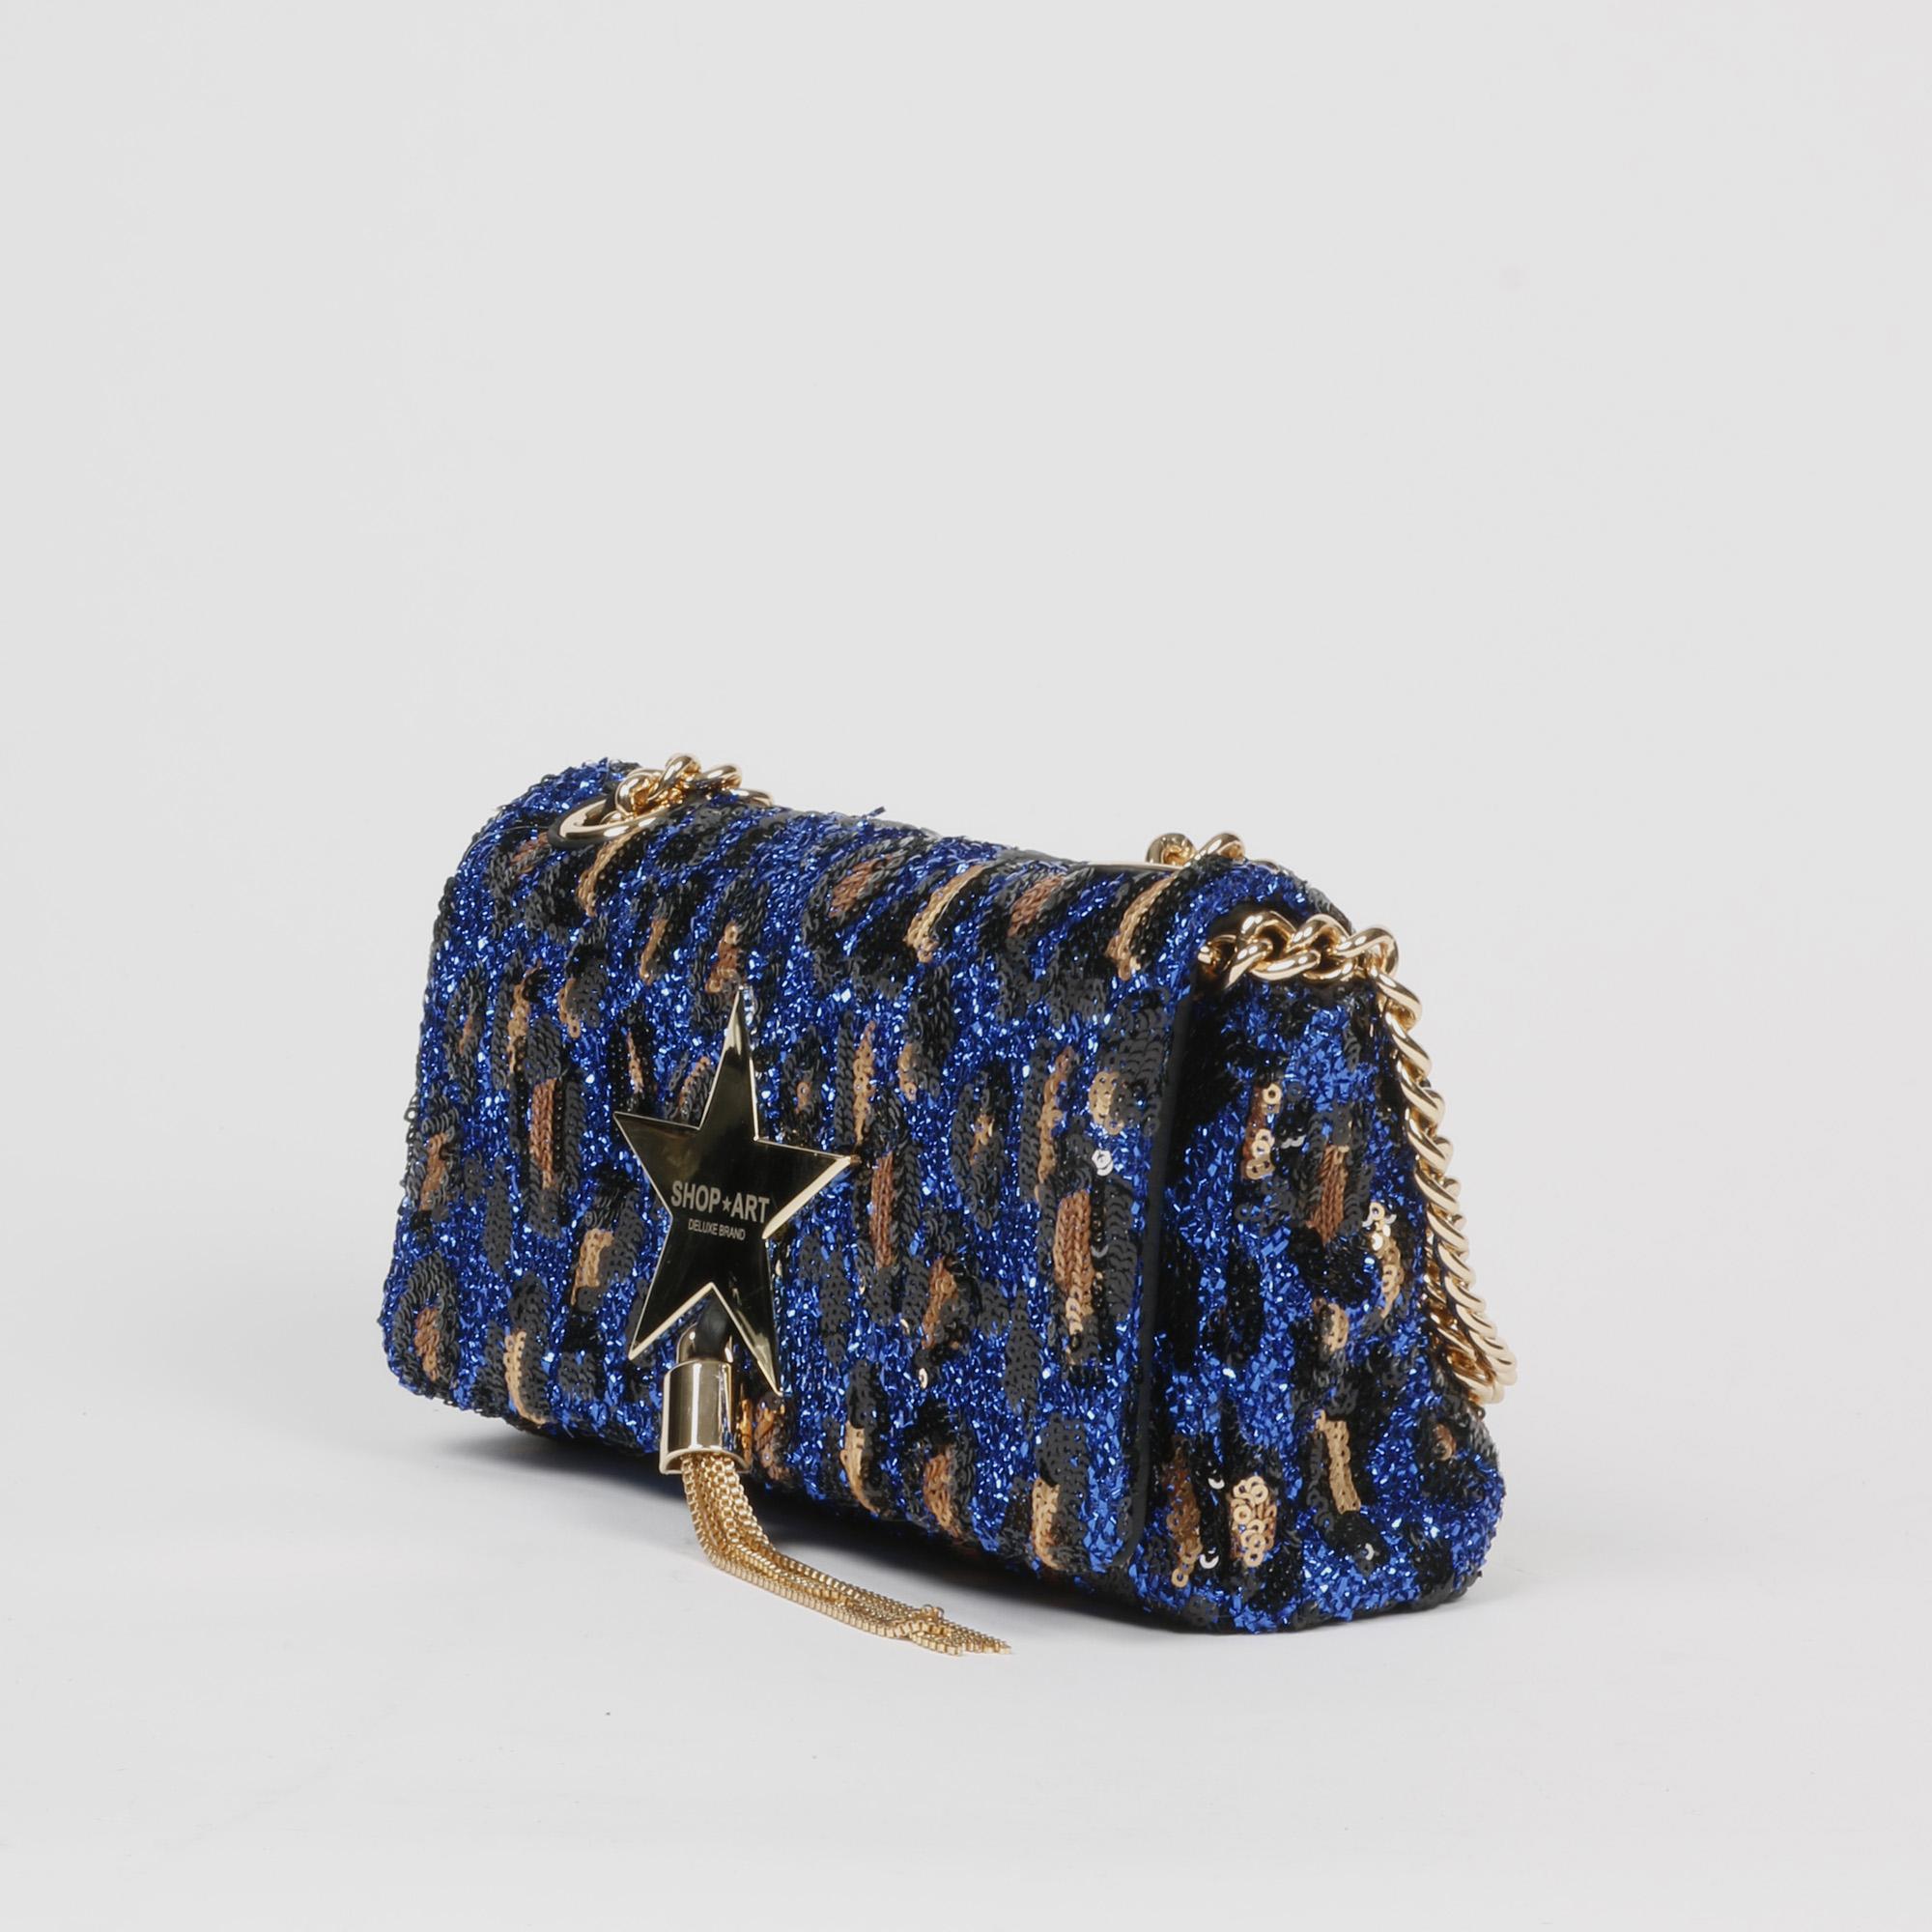 Borsa piccola paillettes - Blu